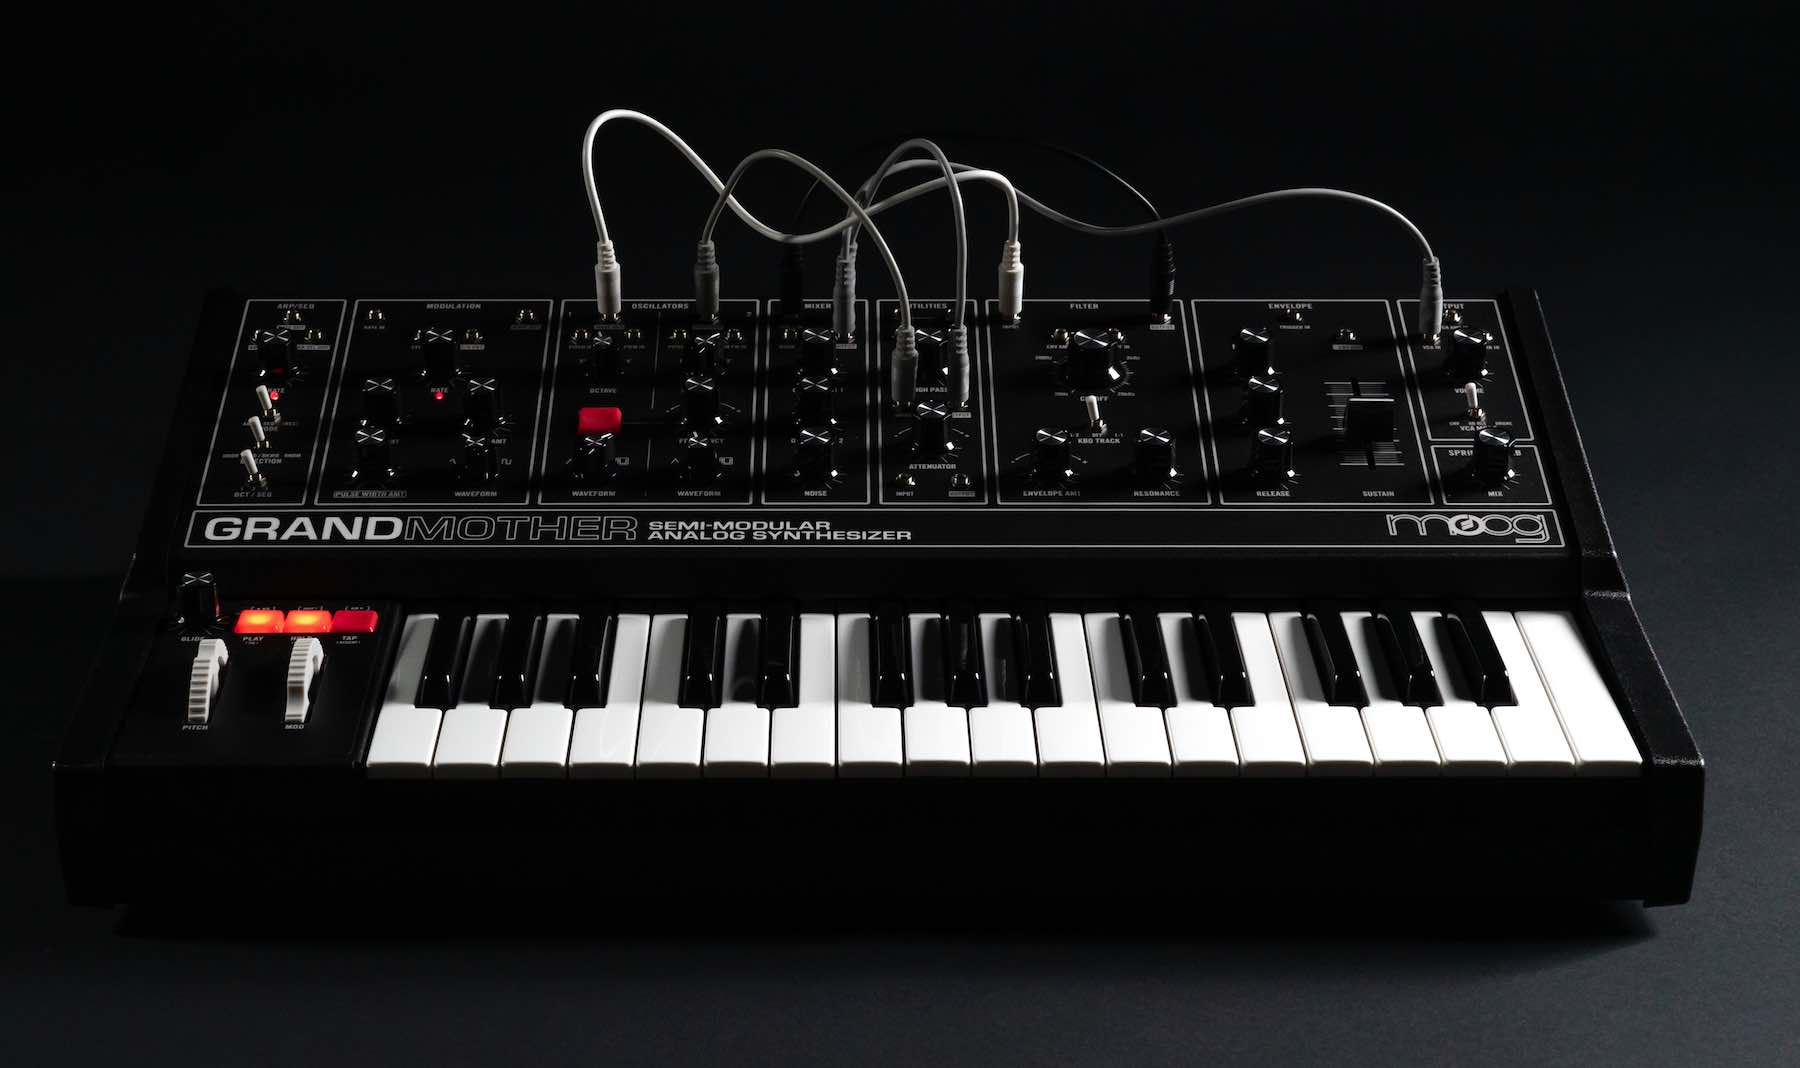 Moog Grandmother dark synth hardware midiware music producer strumenti musicali